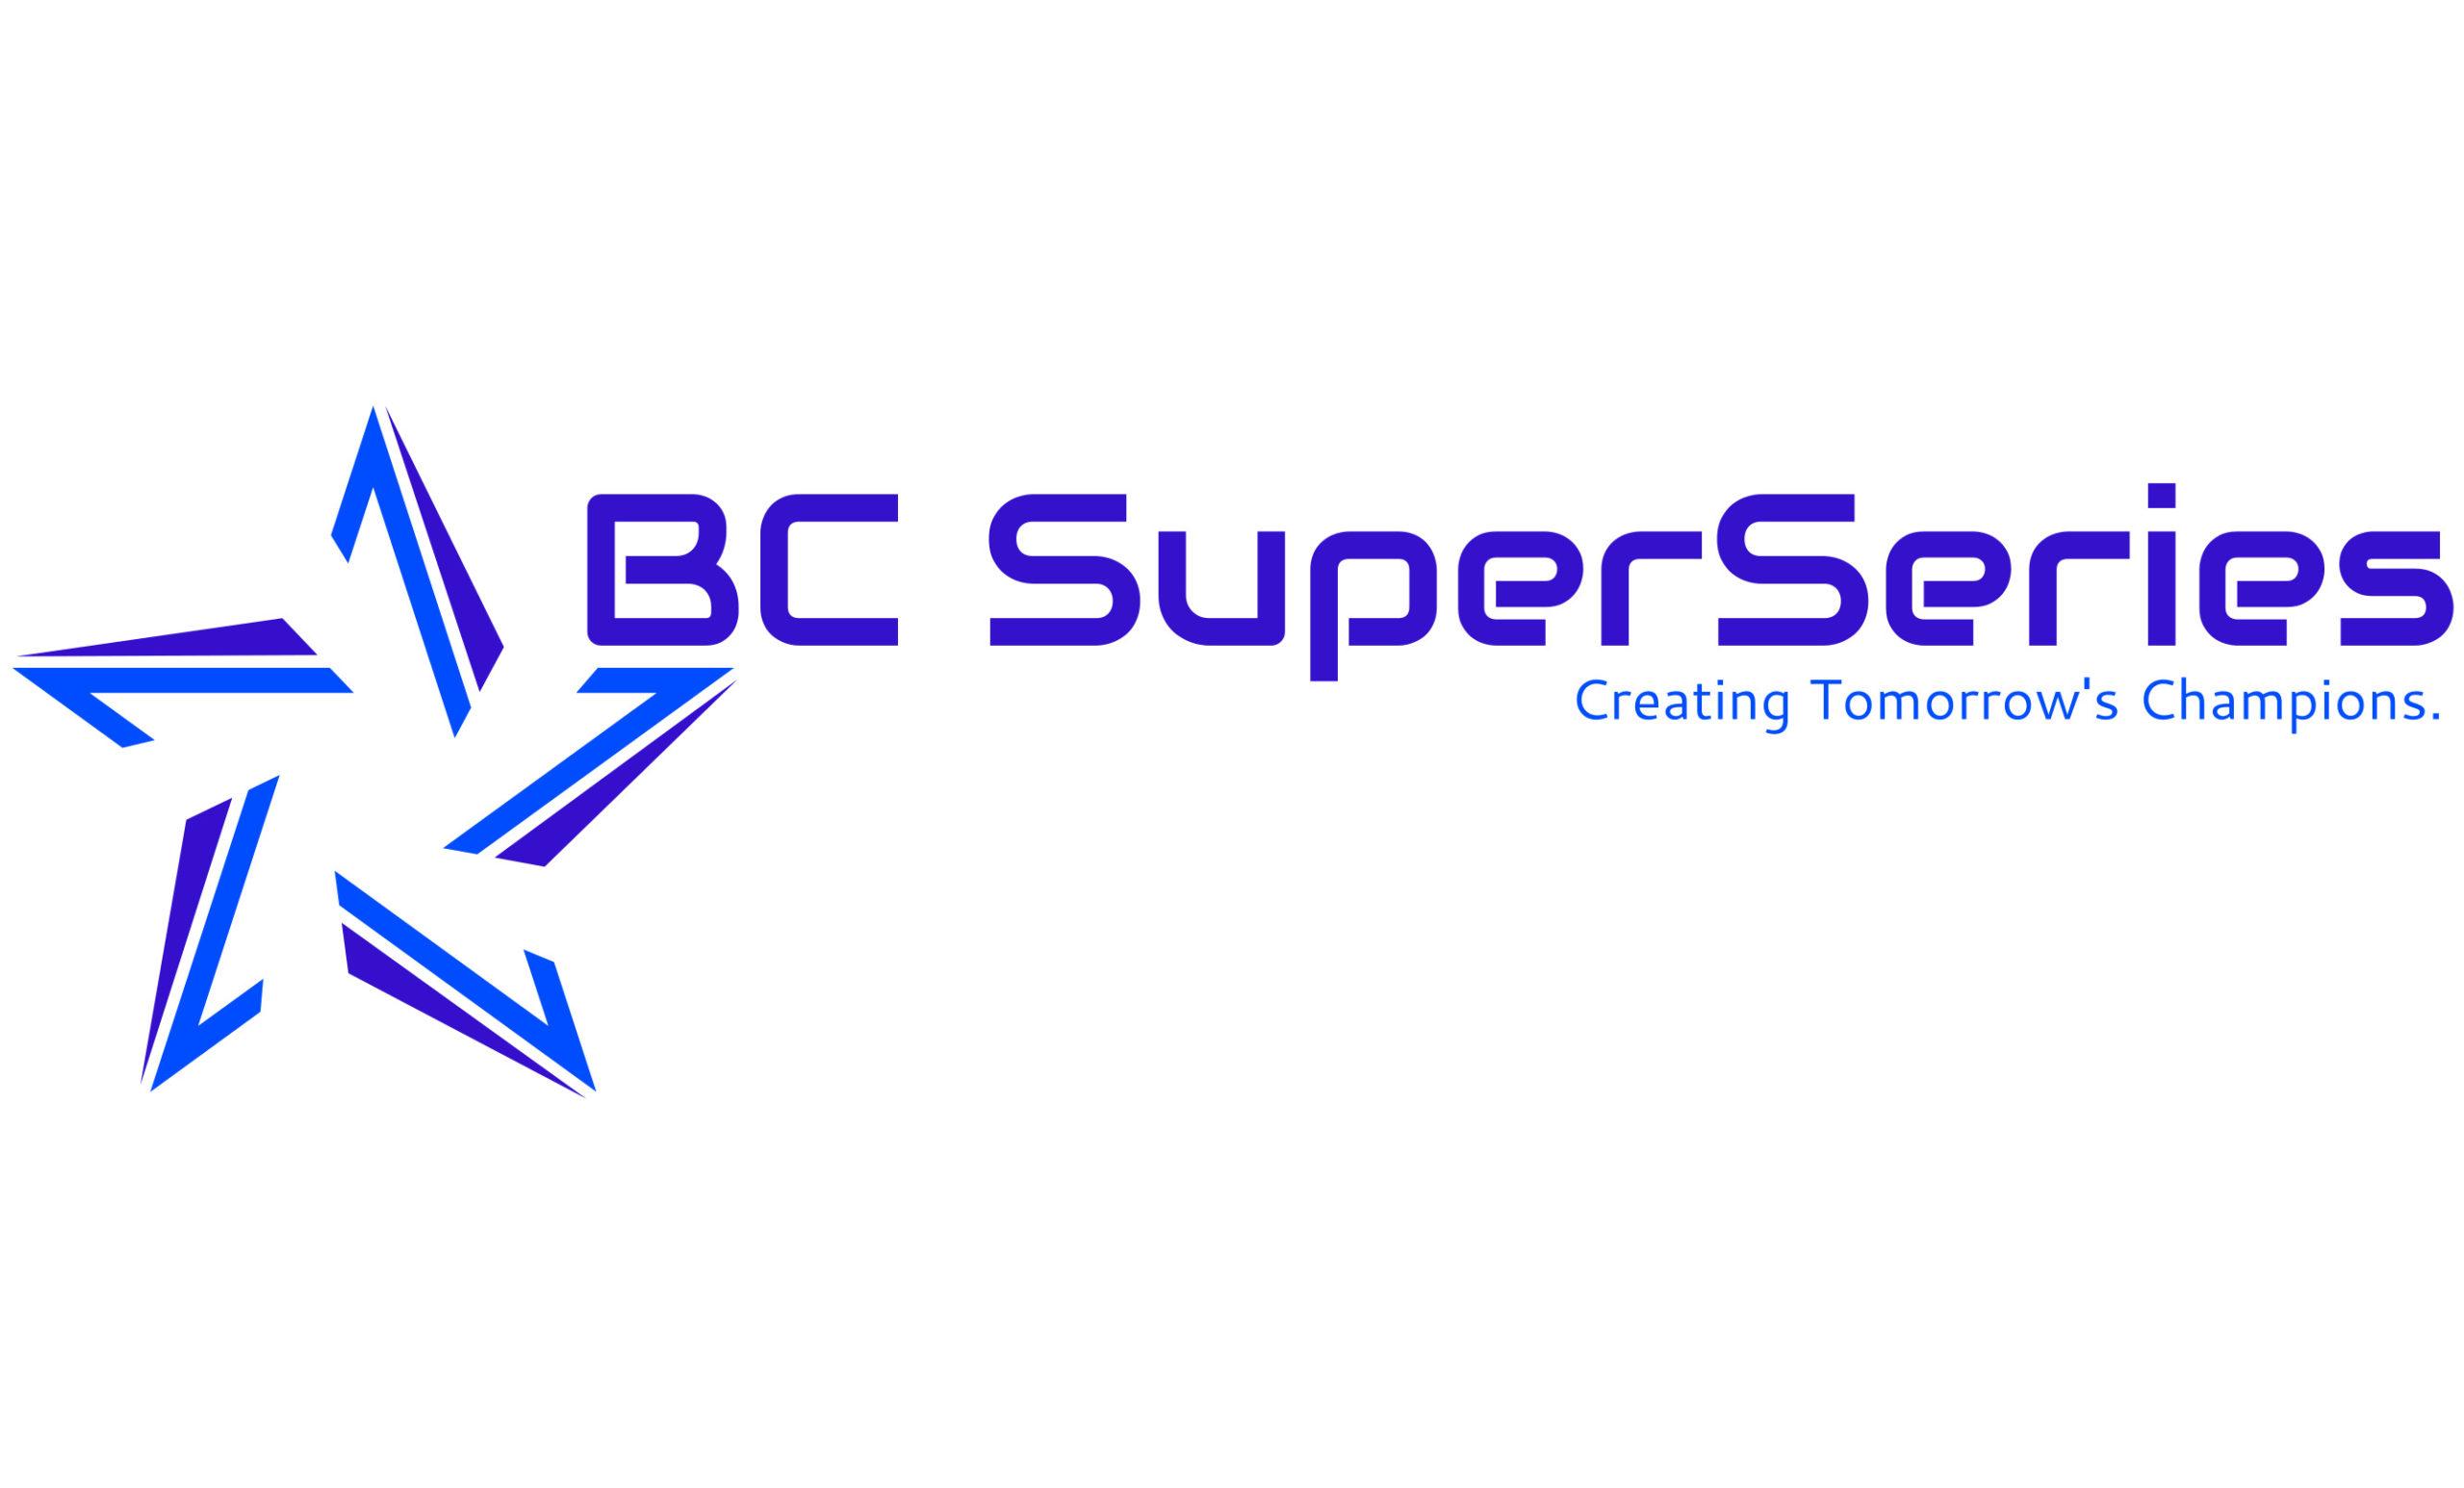 BC Super Series logo